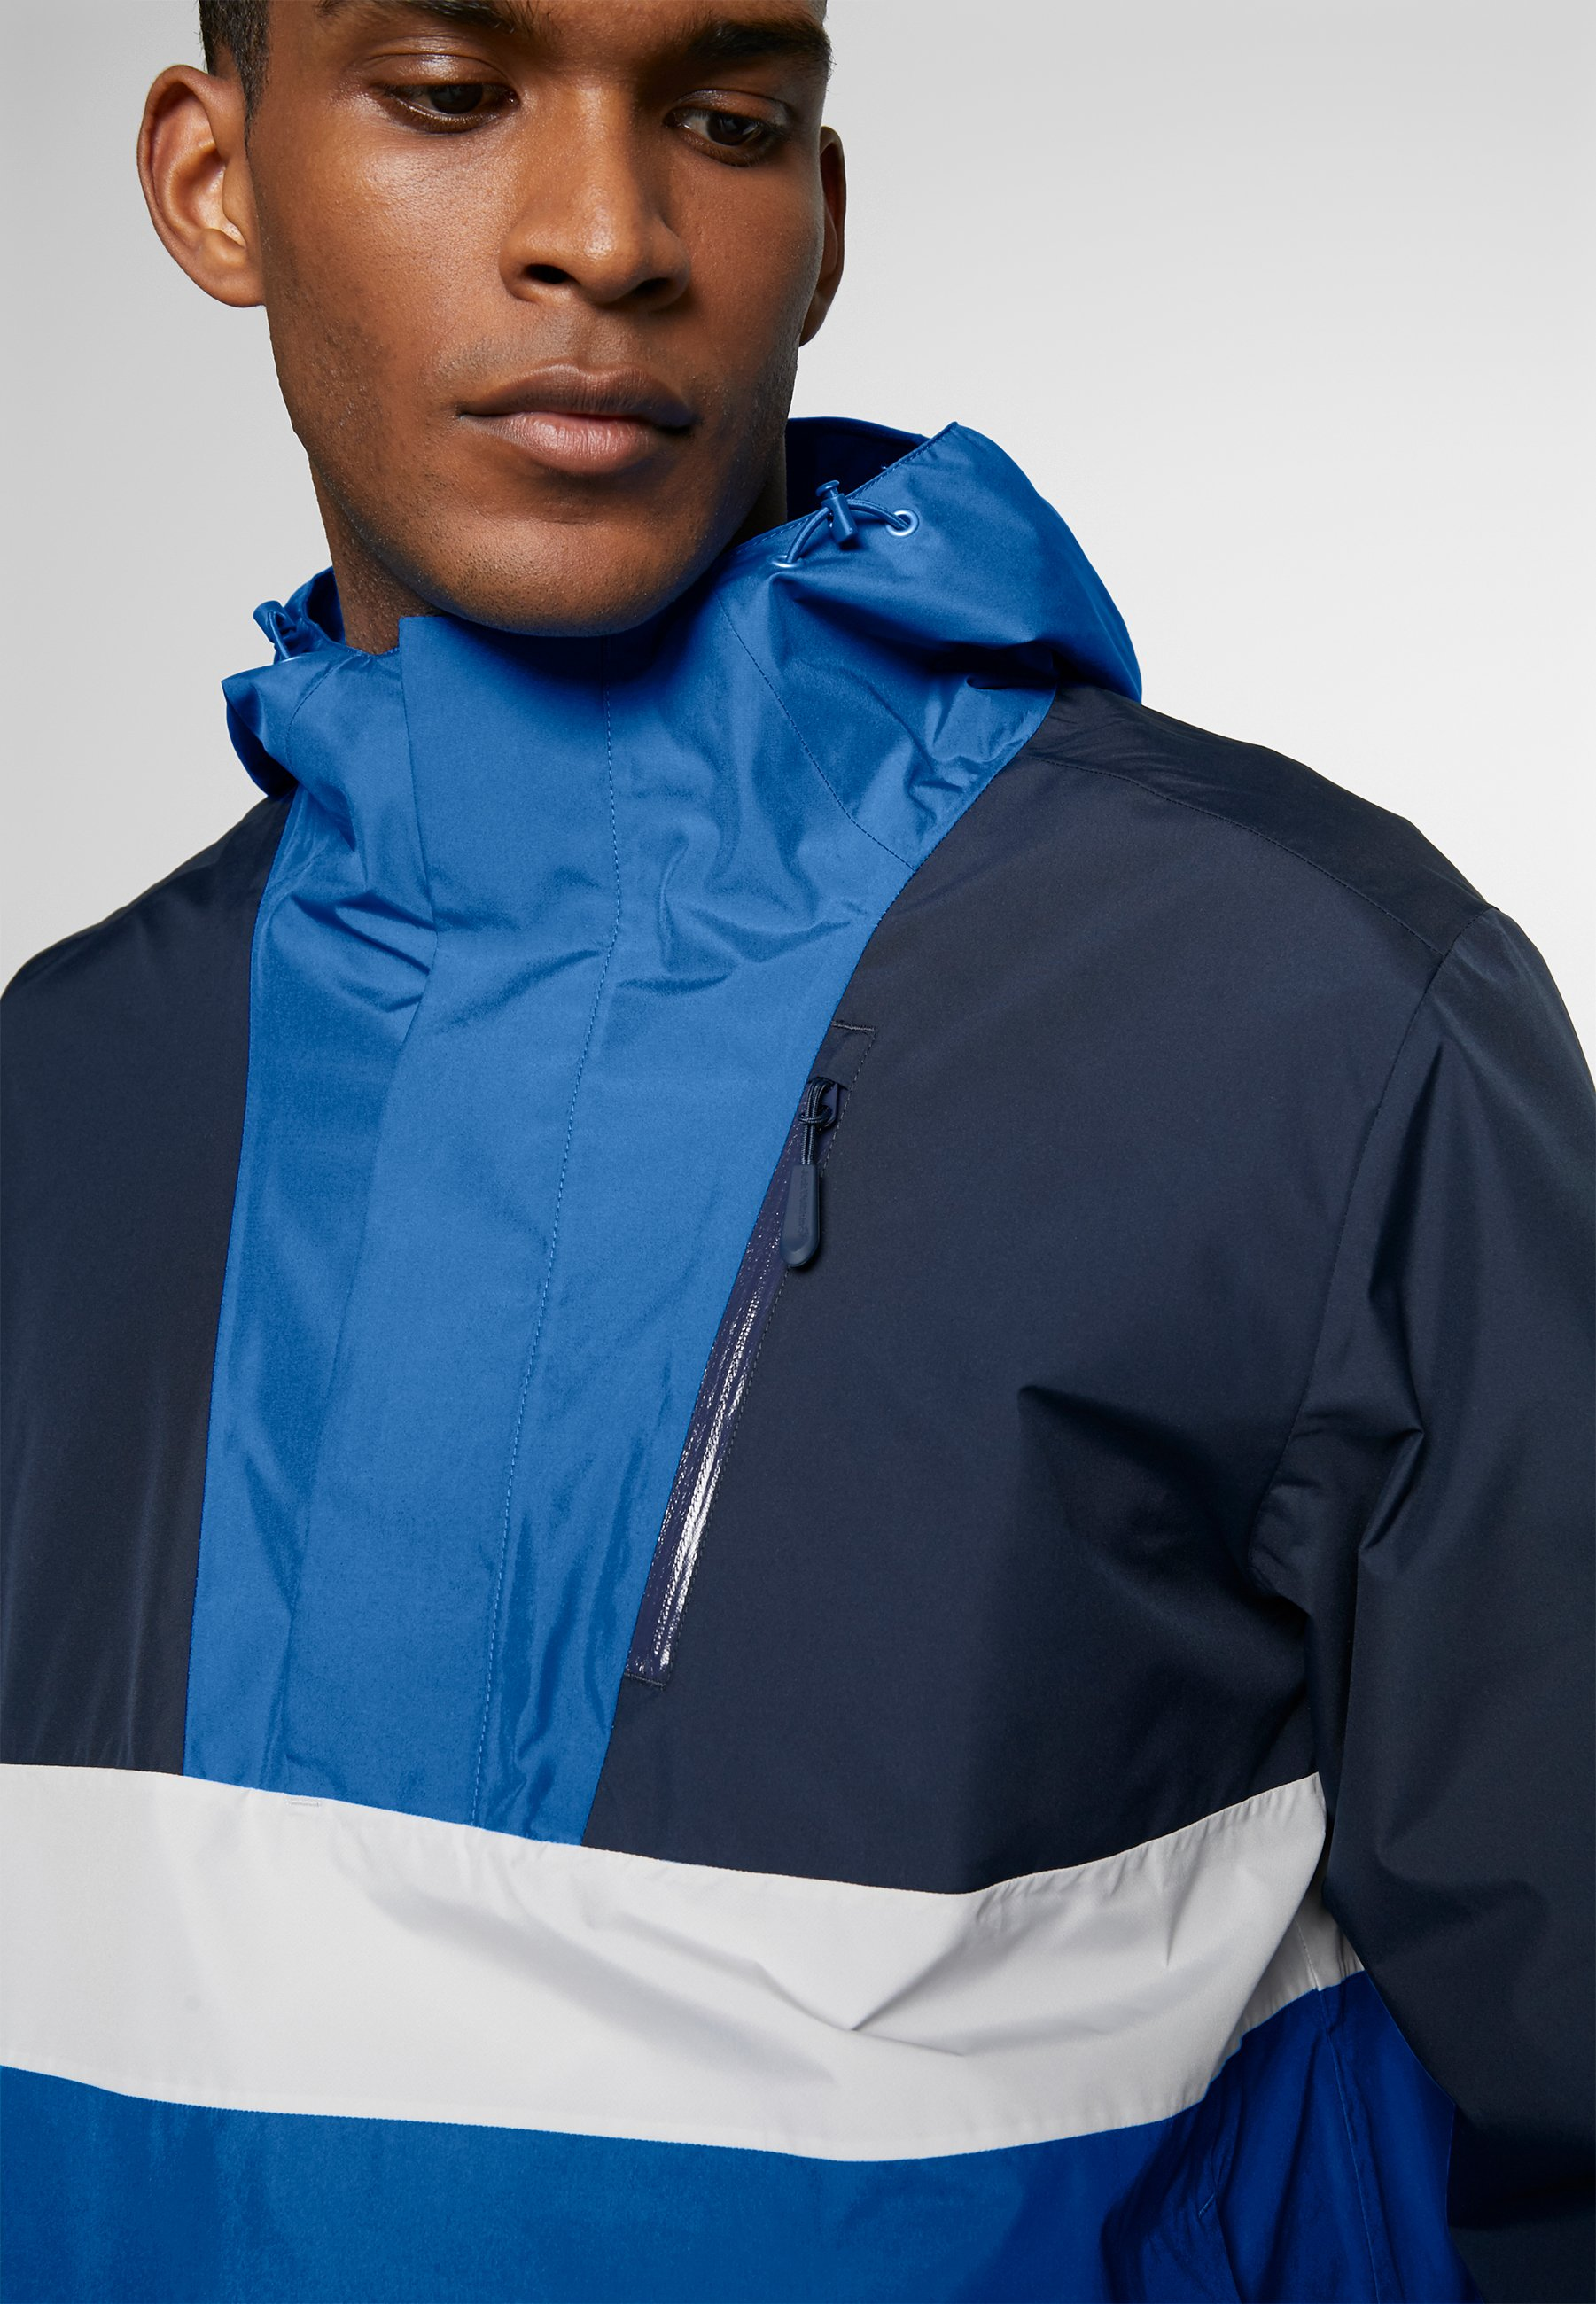 2020 Nouveau Vêtements homme Jack Wolfskin BOOSTER JACKET  Veste Hardshell azure blue fVPLUMel